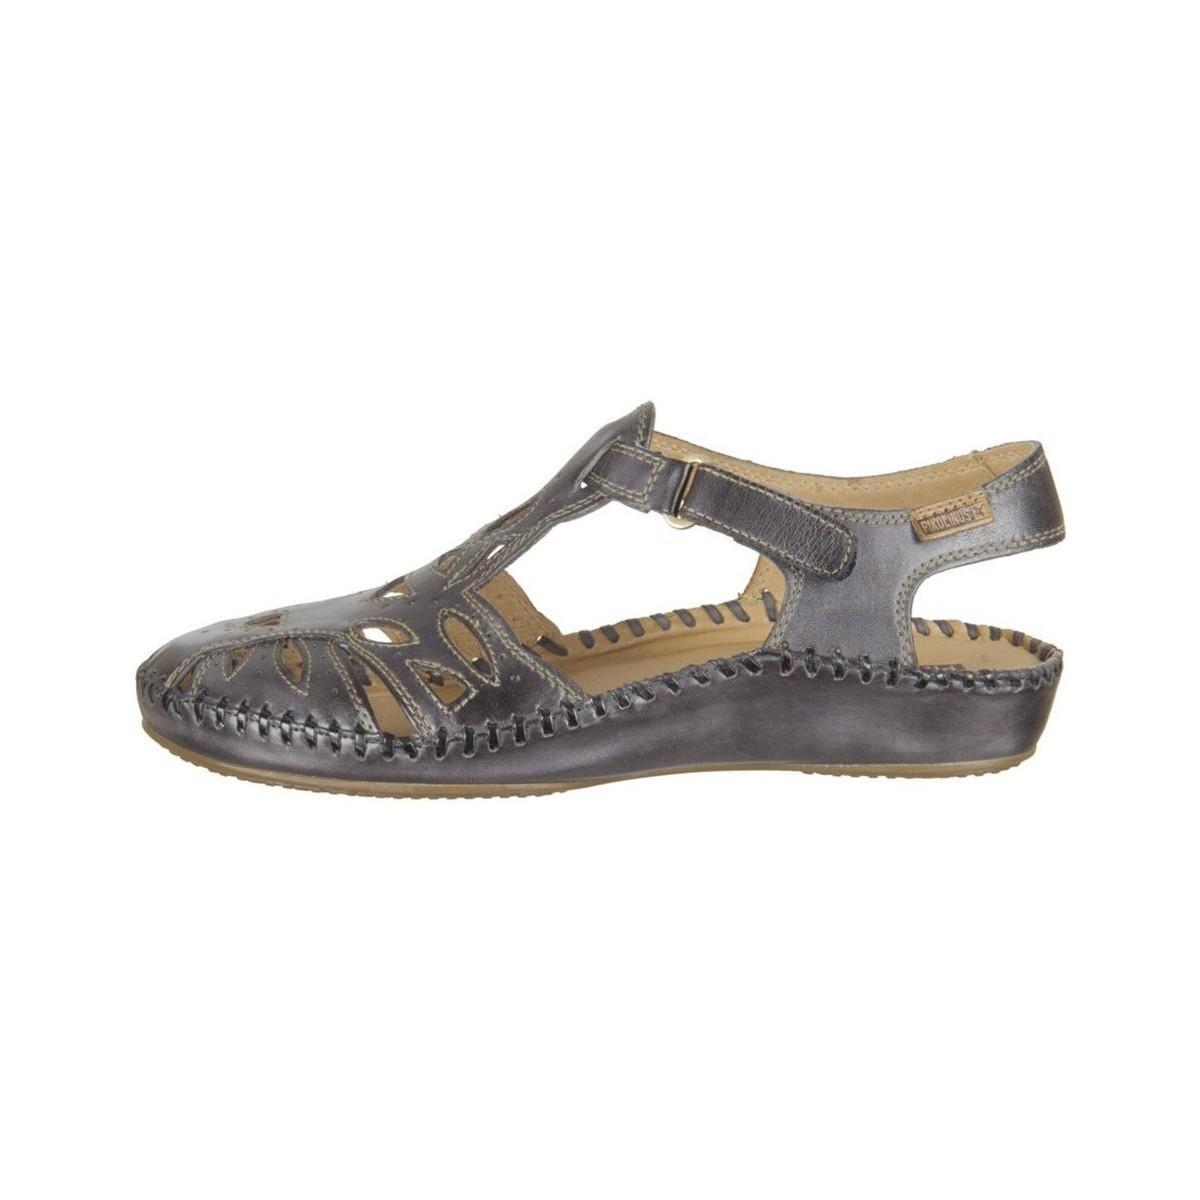 2f2f14aee3d Pikolinos Vallarta Women s Sandals In Multicolour - Lyst